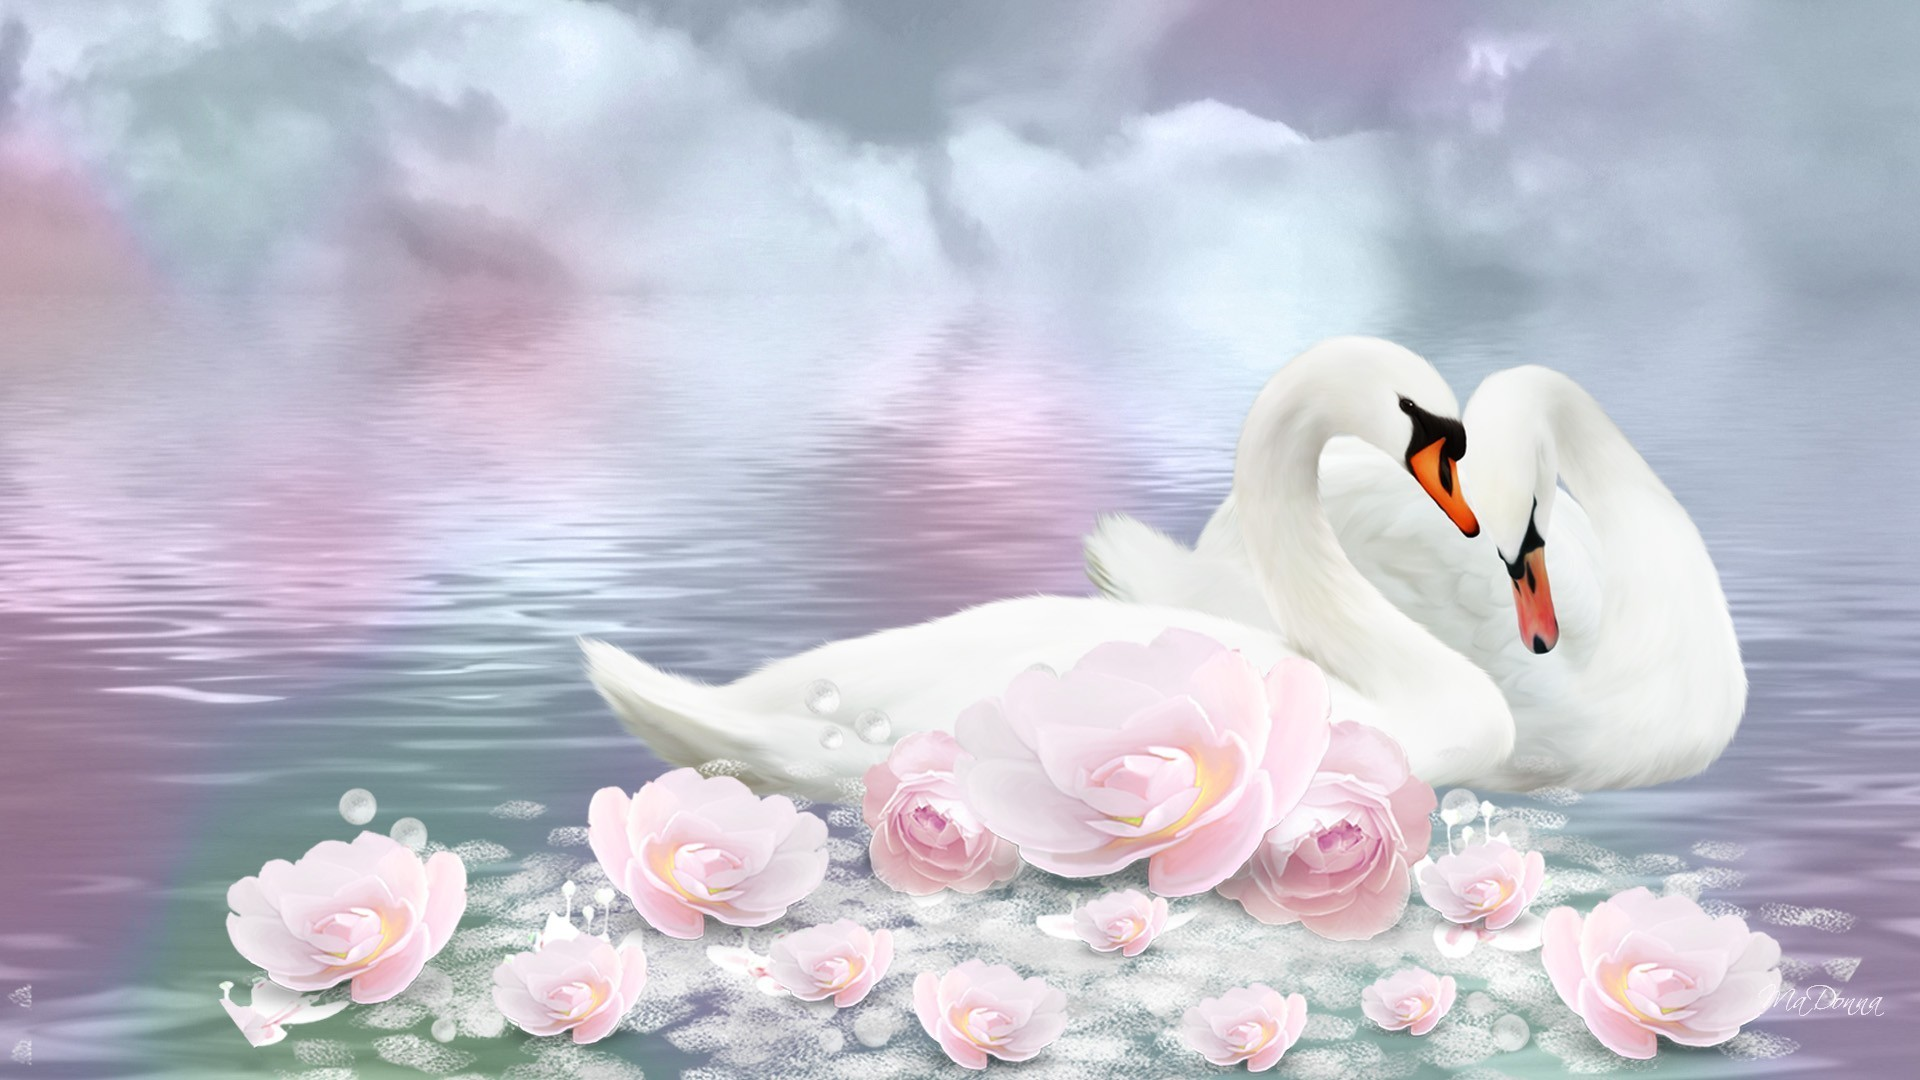 Hasil gambar untuk اجمل الصور الرومانسية للعشاق